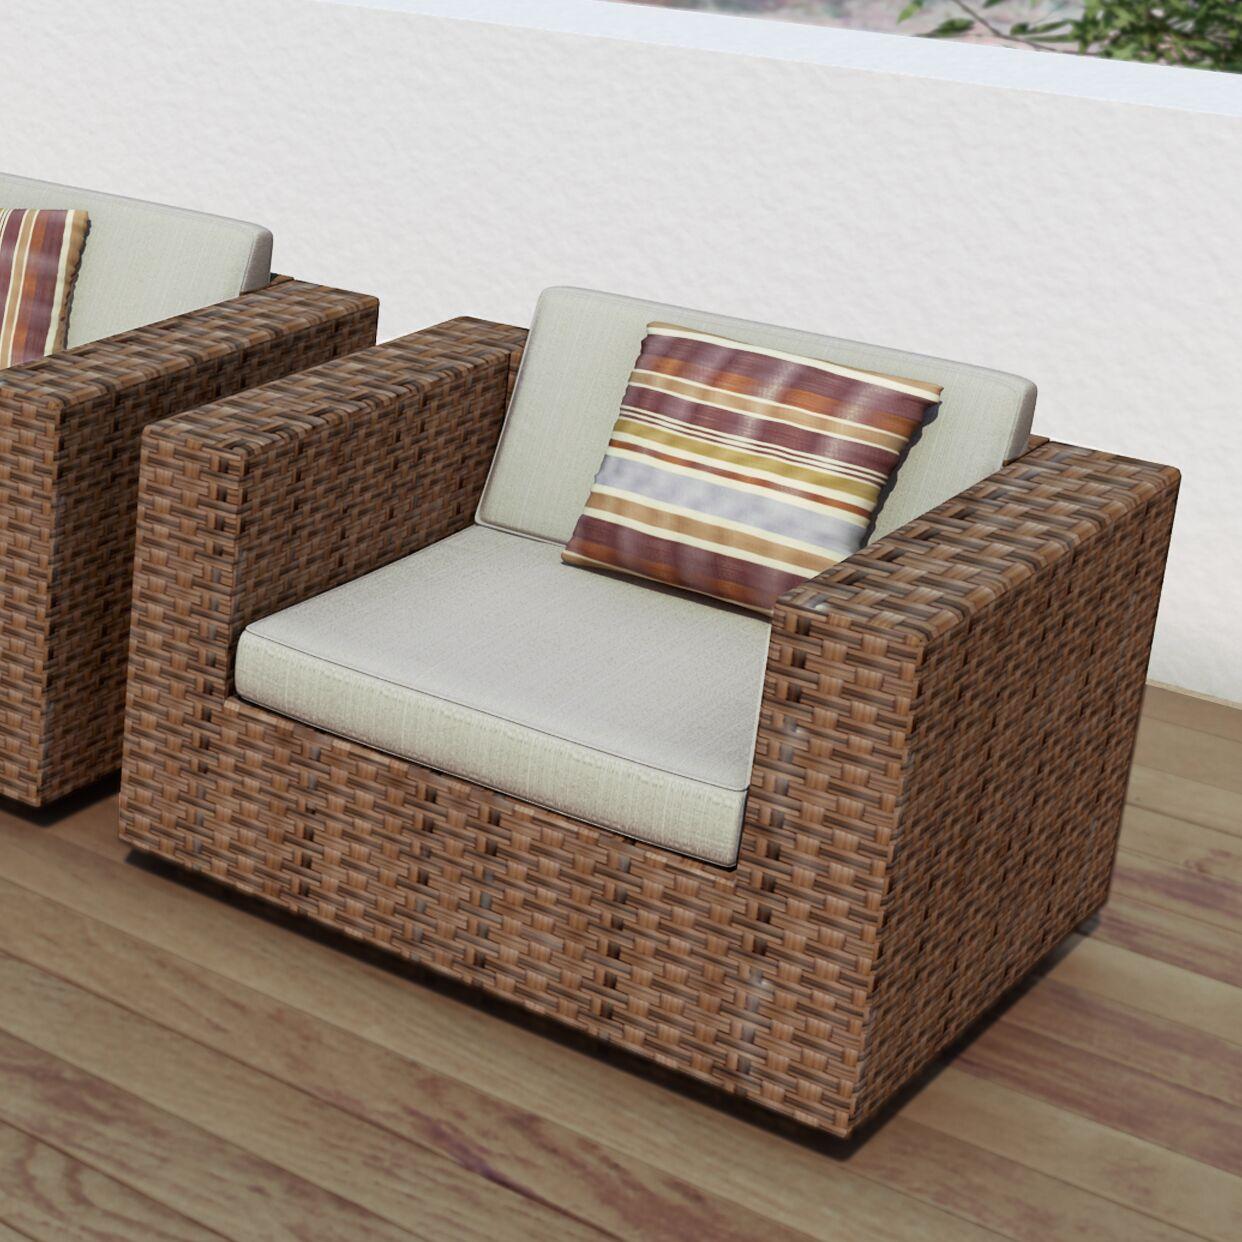 Park Terrace 5 Piece Sofa Set with Cushions Color: Saddle Strap Weave